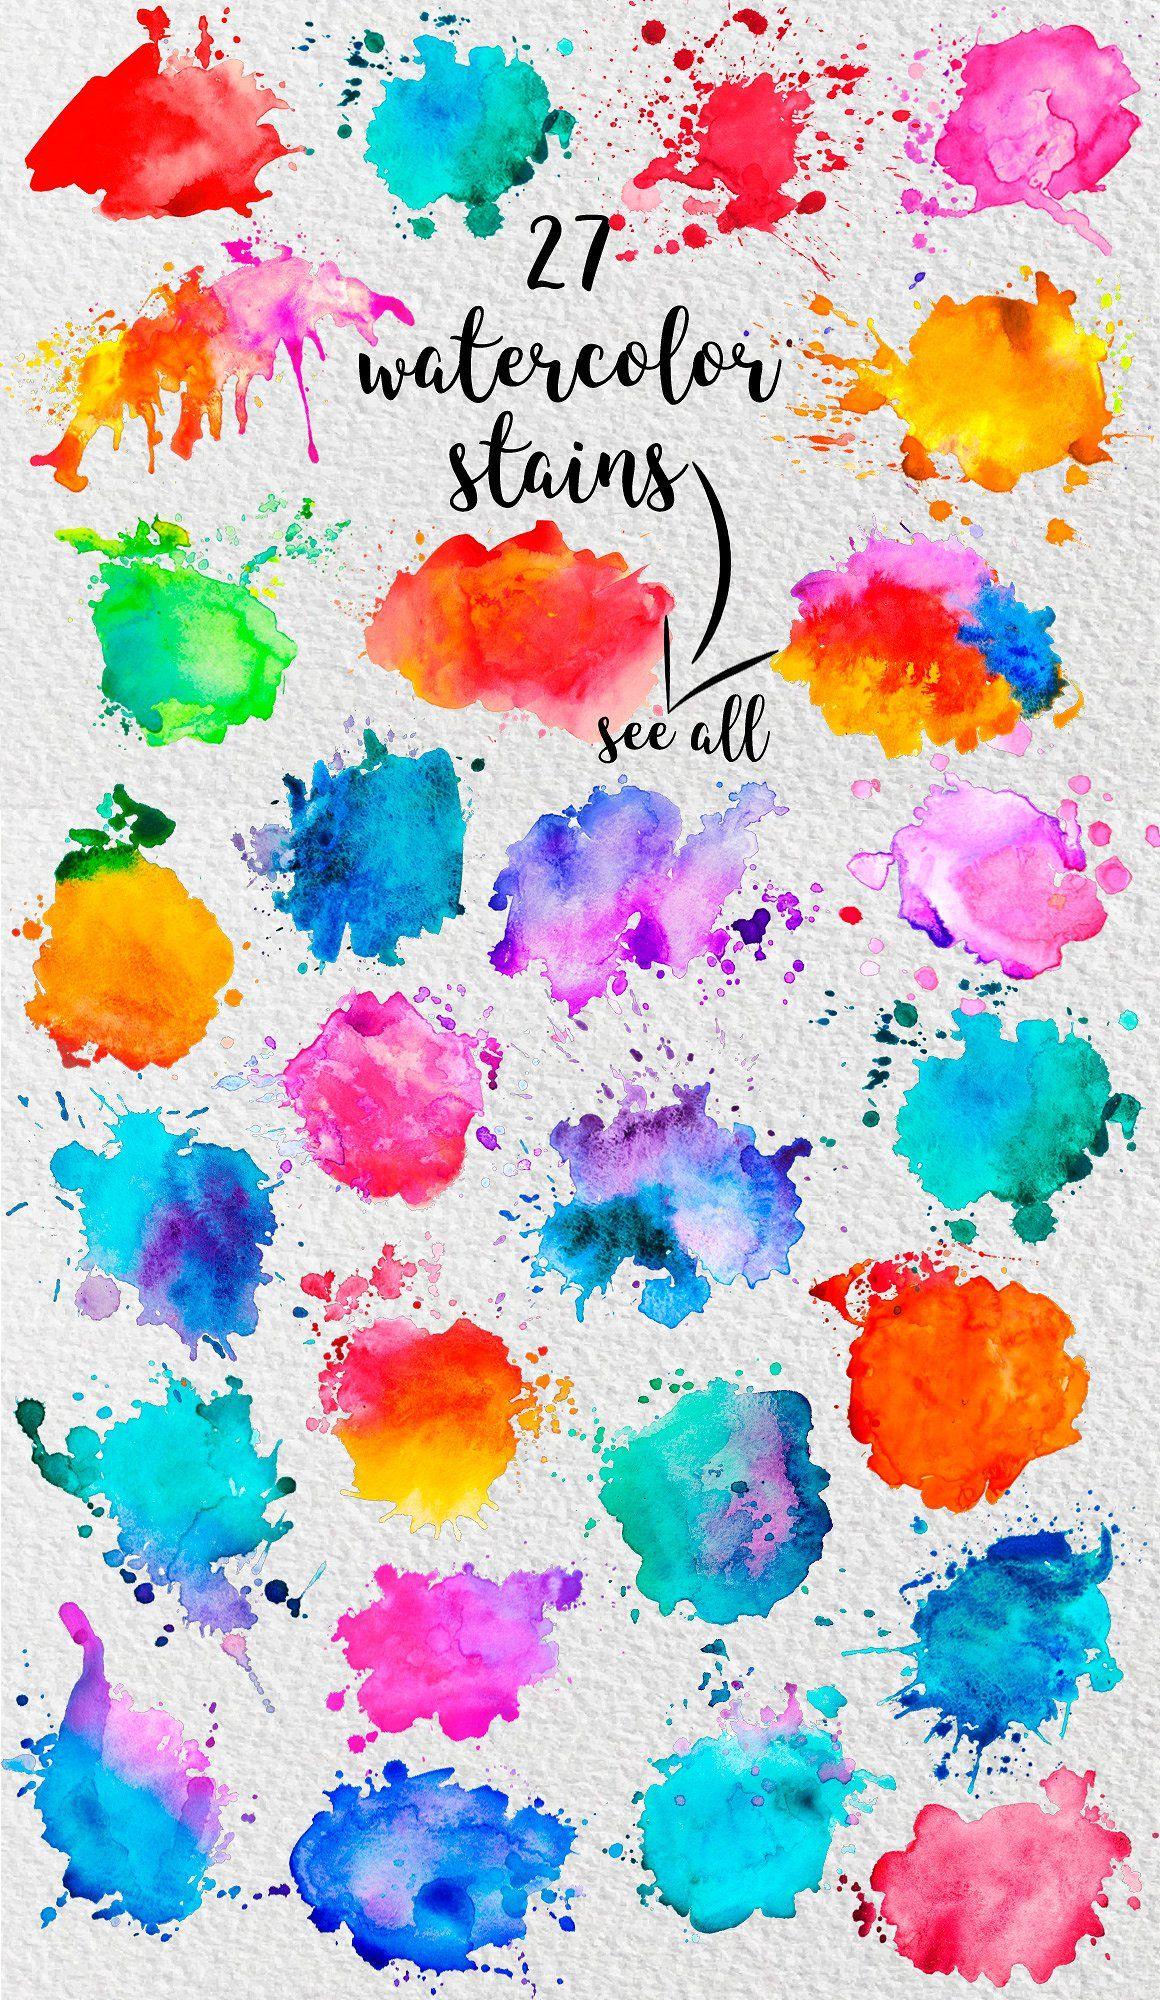 27 Watercolor Stains Watercolor Splash Watercolor Splatter